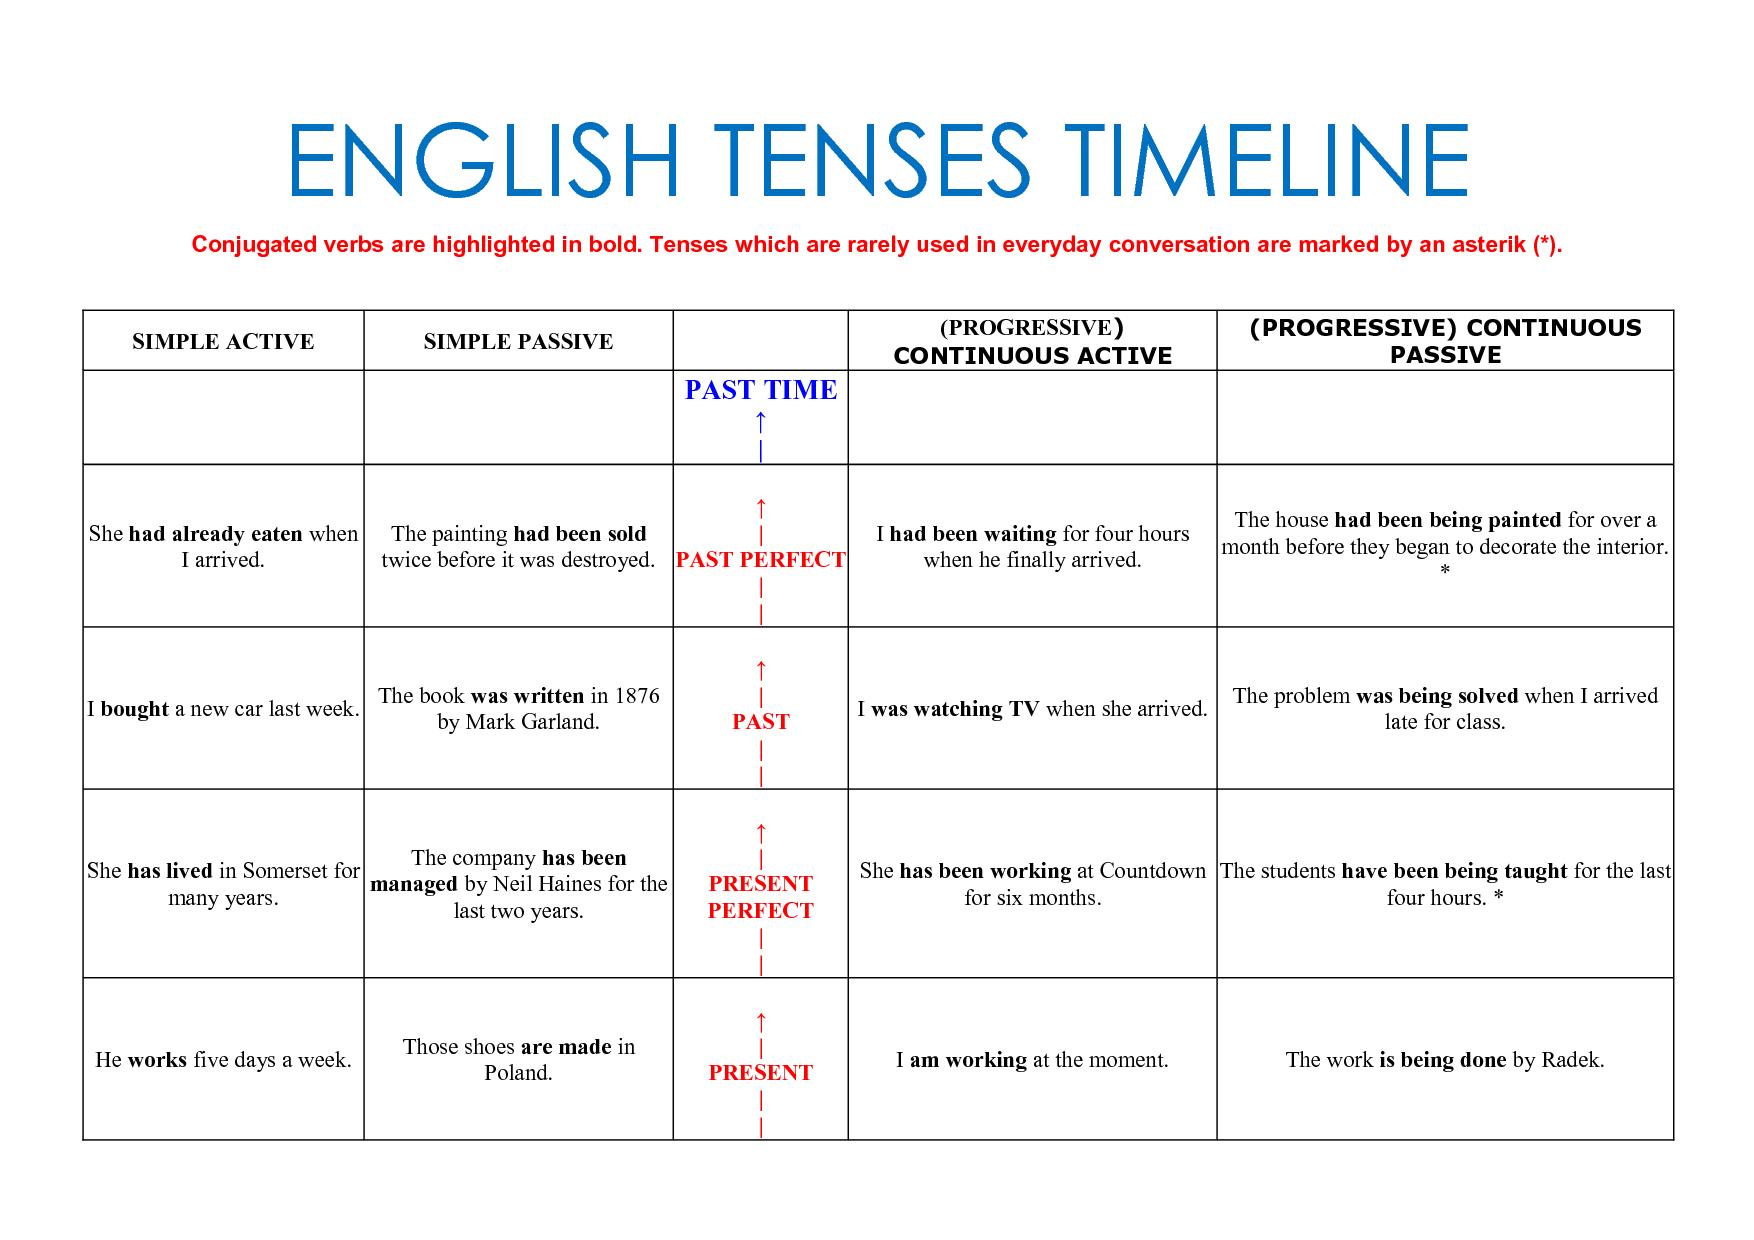 English Tenses Timeline